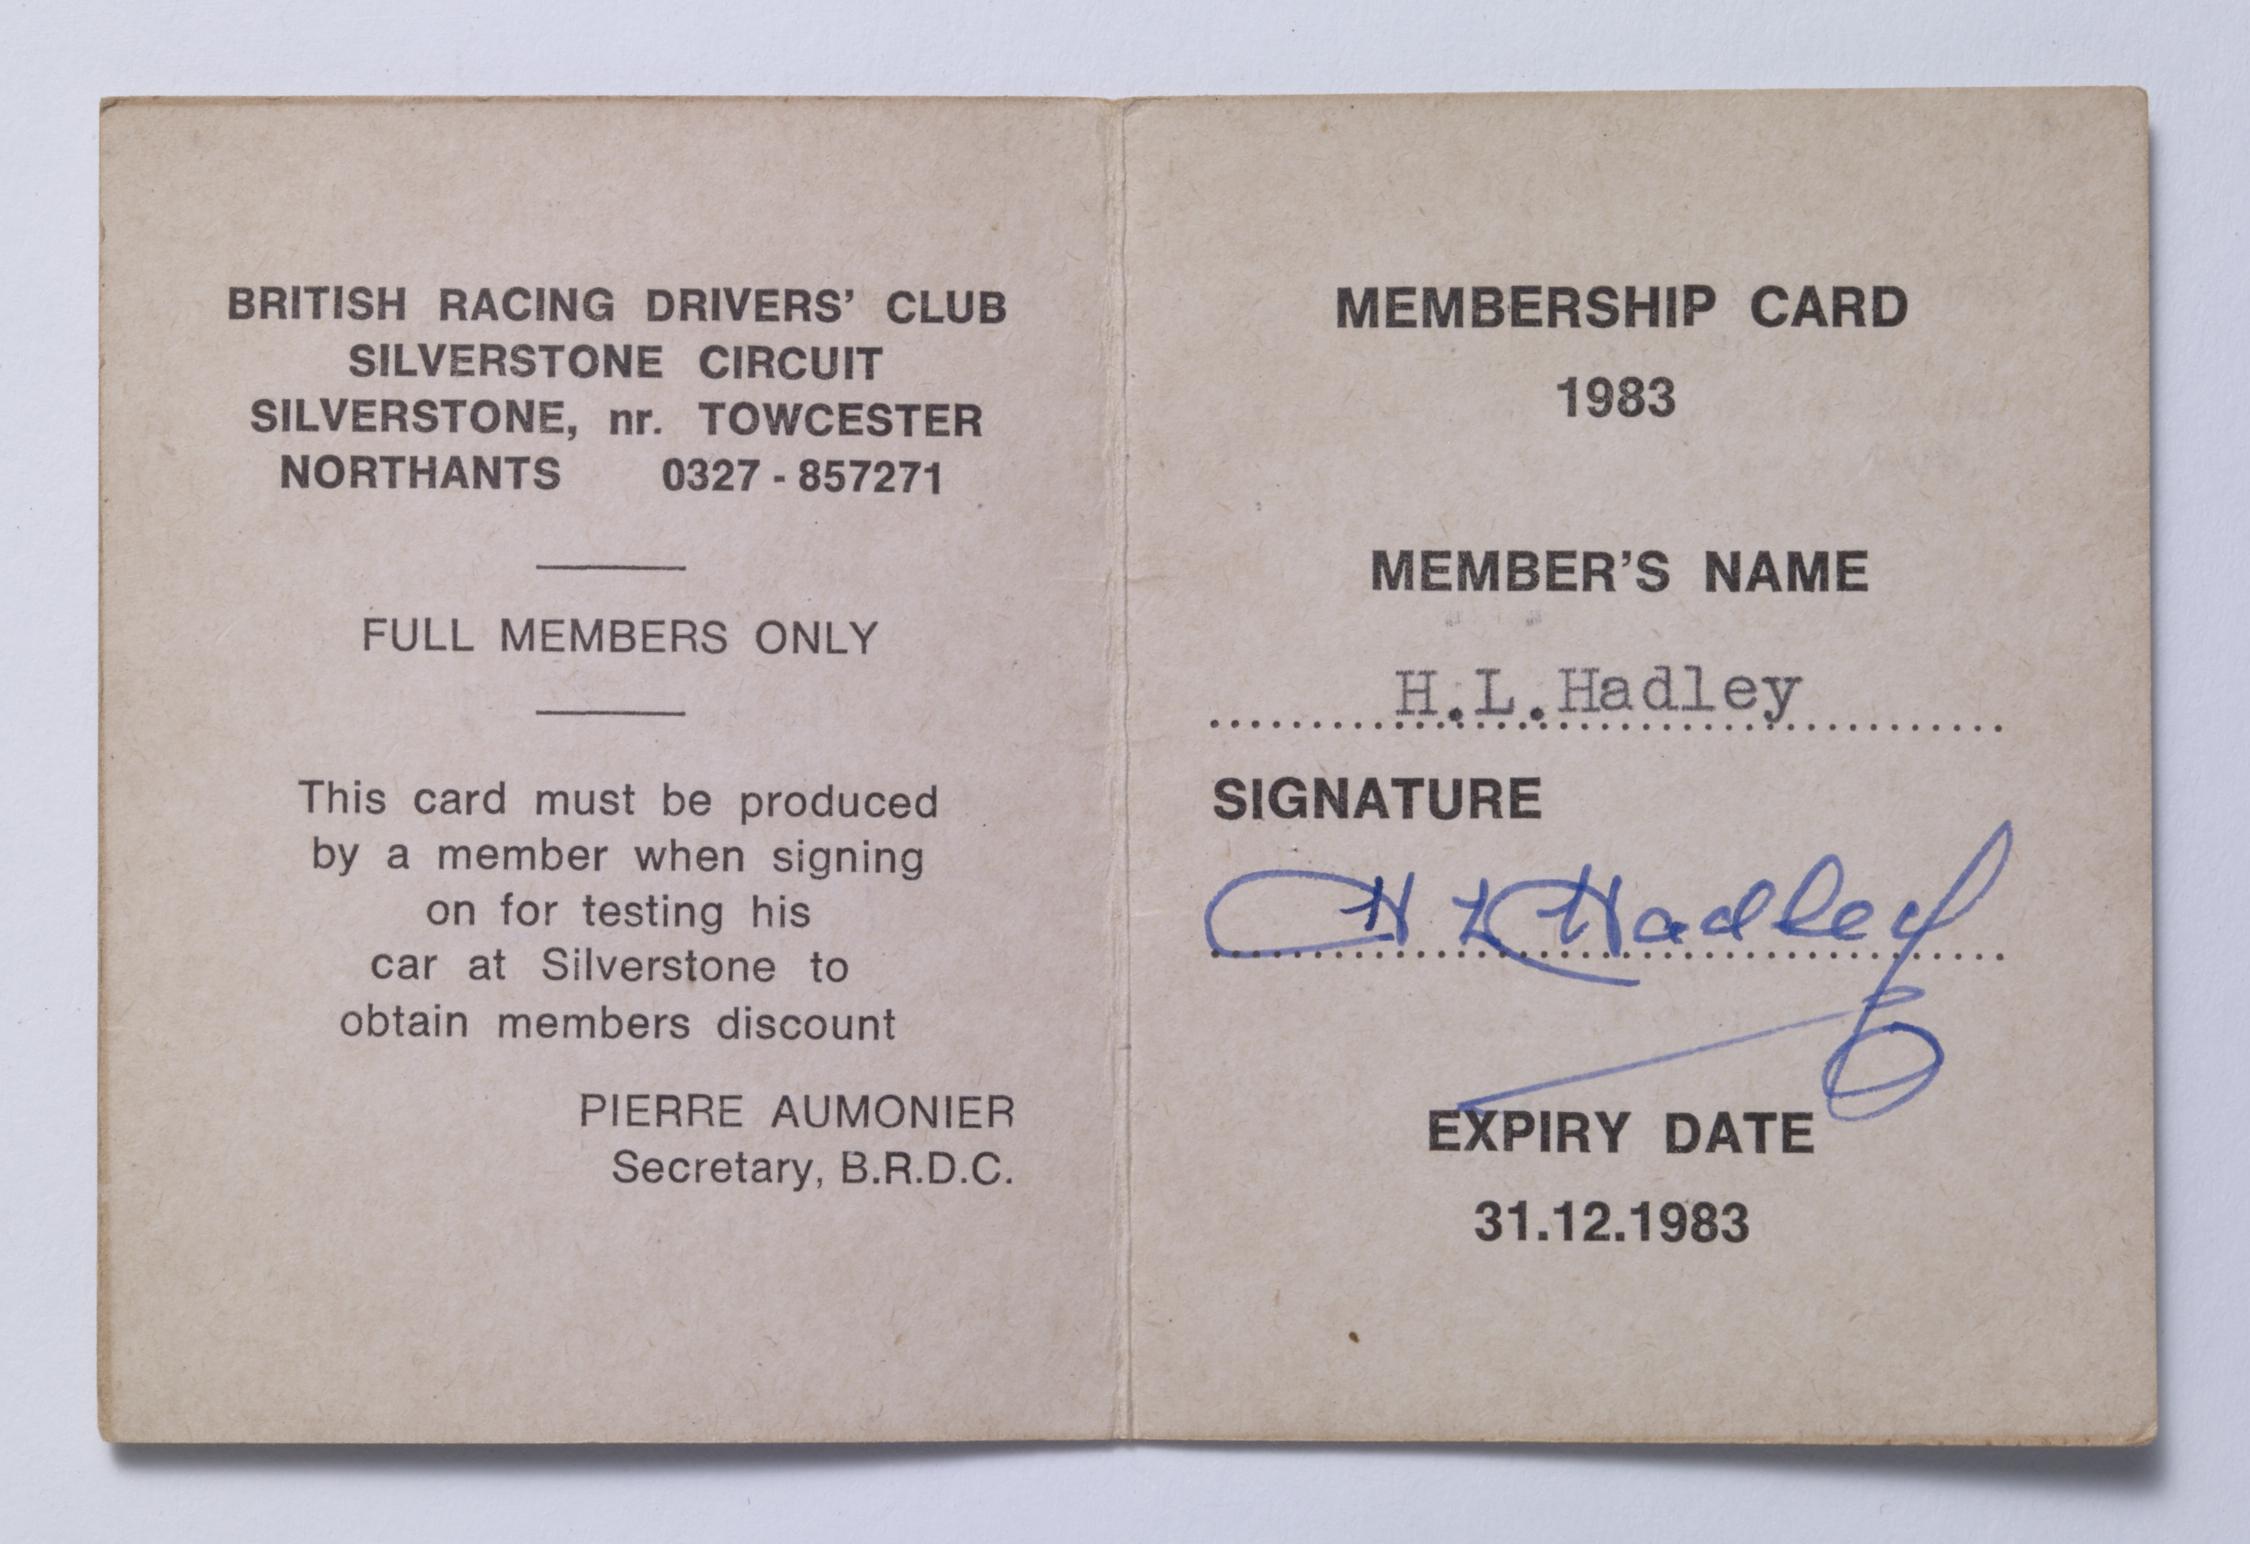 BRDC-Life members card - Inside - H.L. Hadley Image